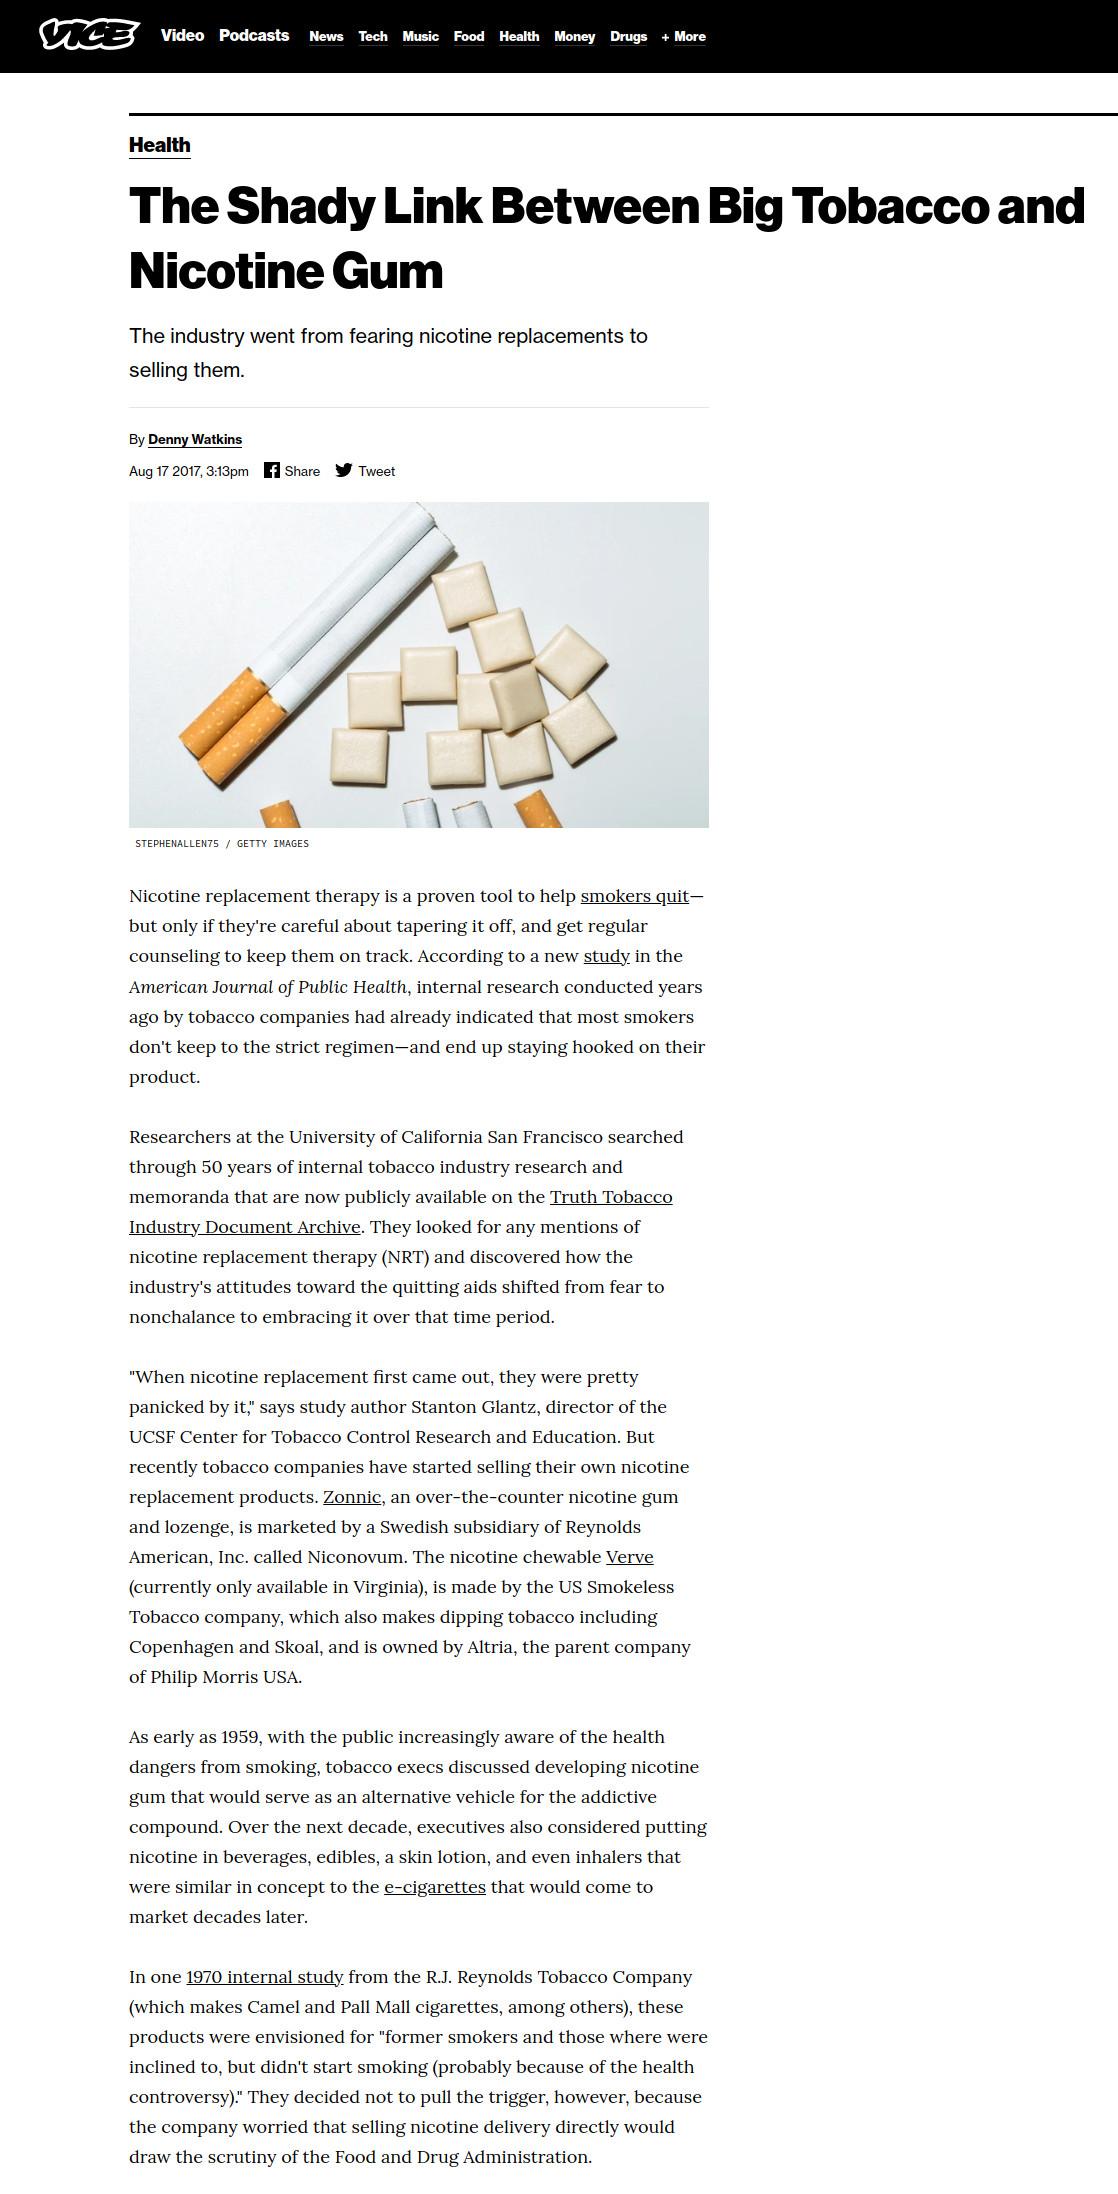 vice_nicotine1